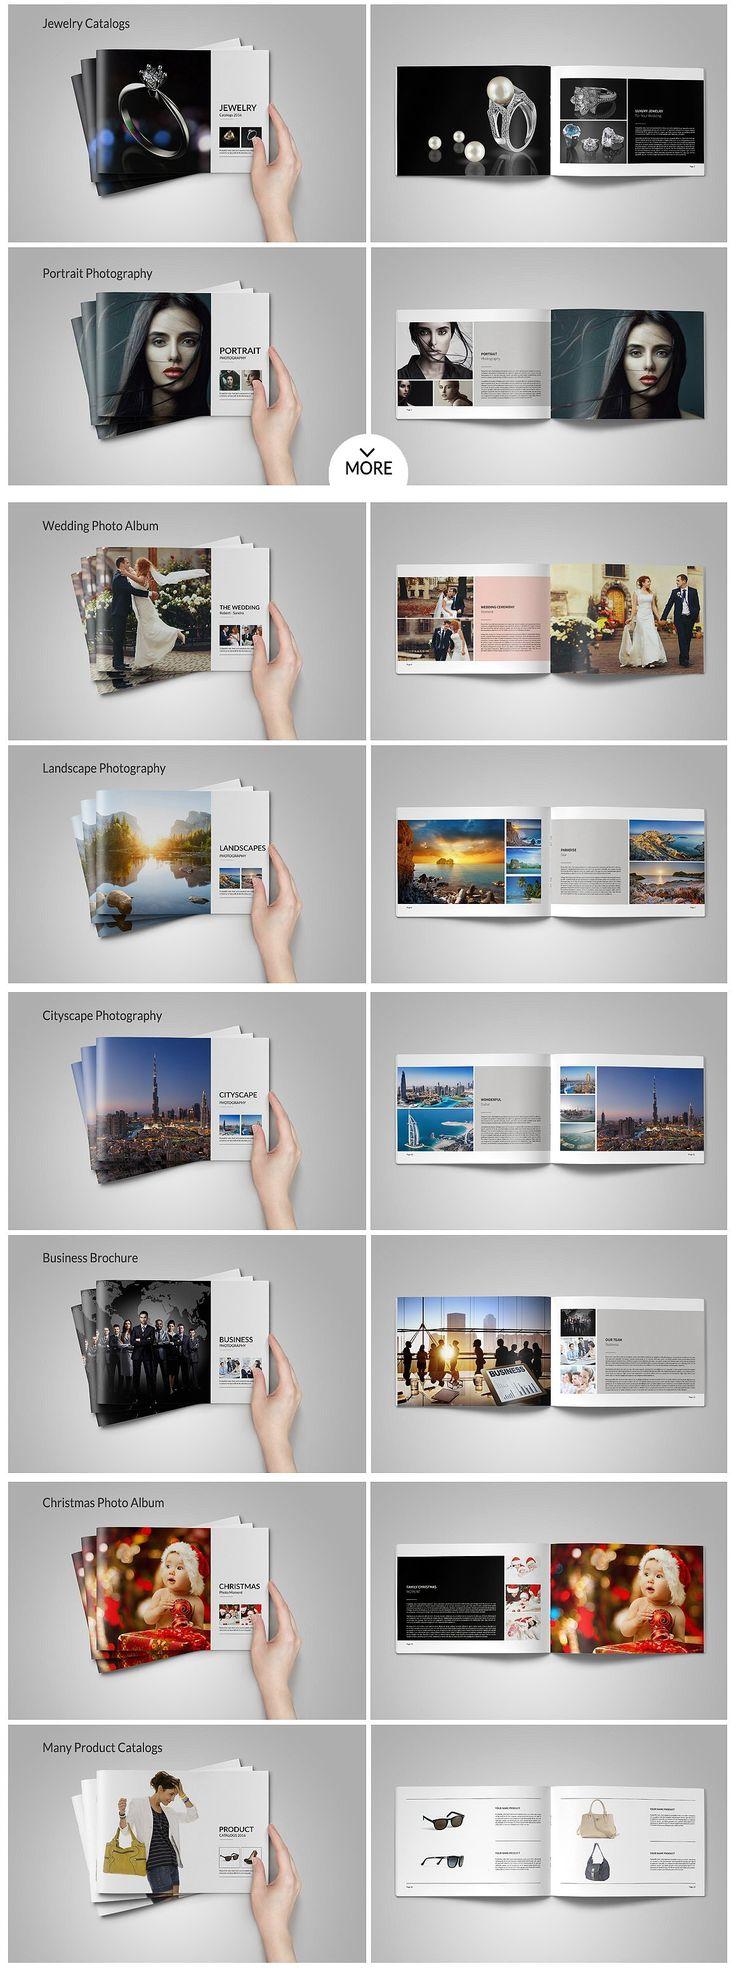 Catalogs / Brochure Interior Vol. 6 by tujuhbenua on @creativemarket